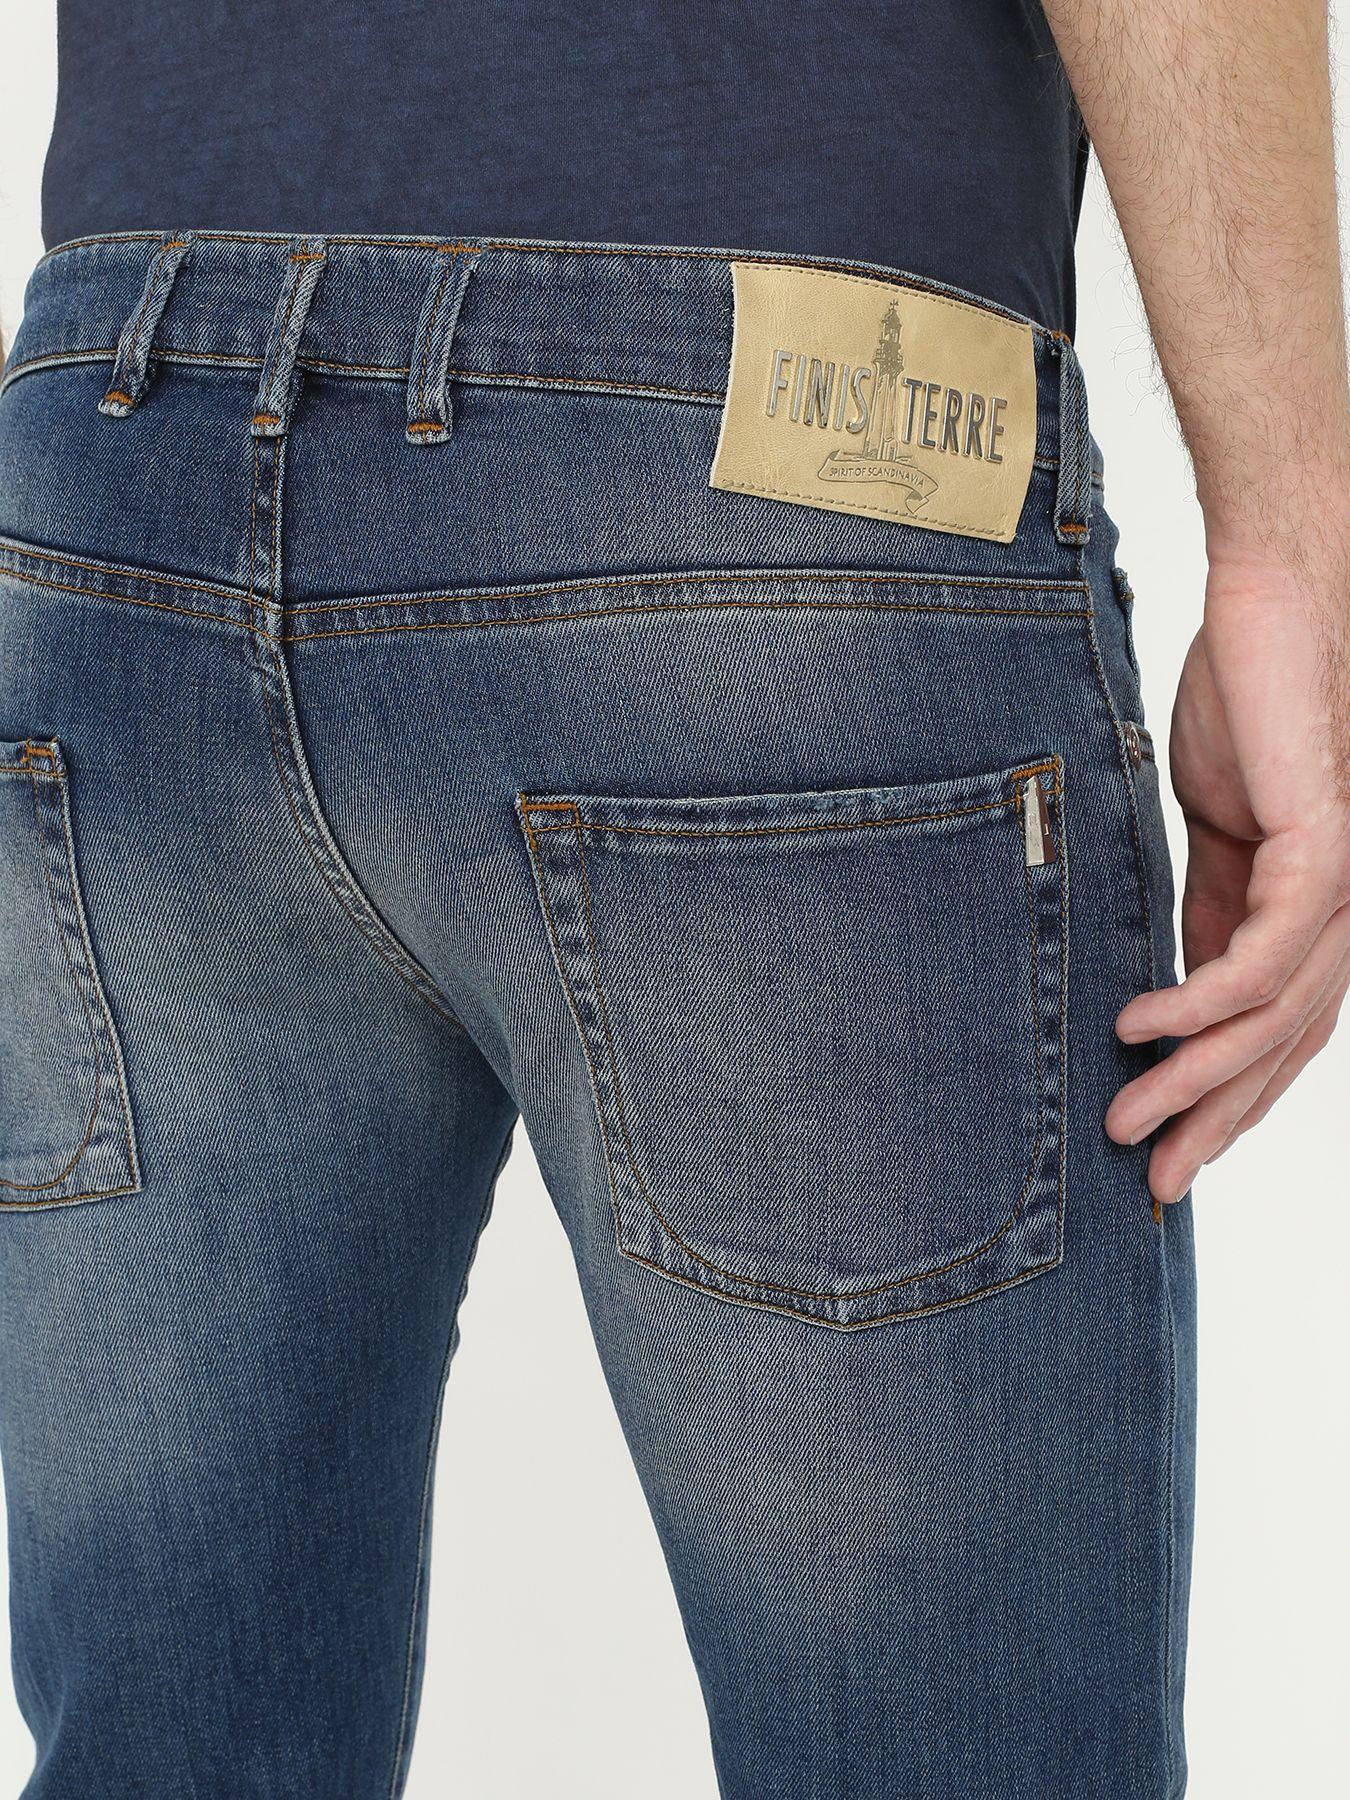 Finisterre | Finisterre Узкие мужские джинсы | Clouty